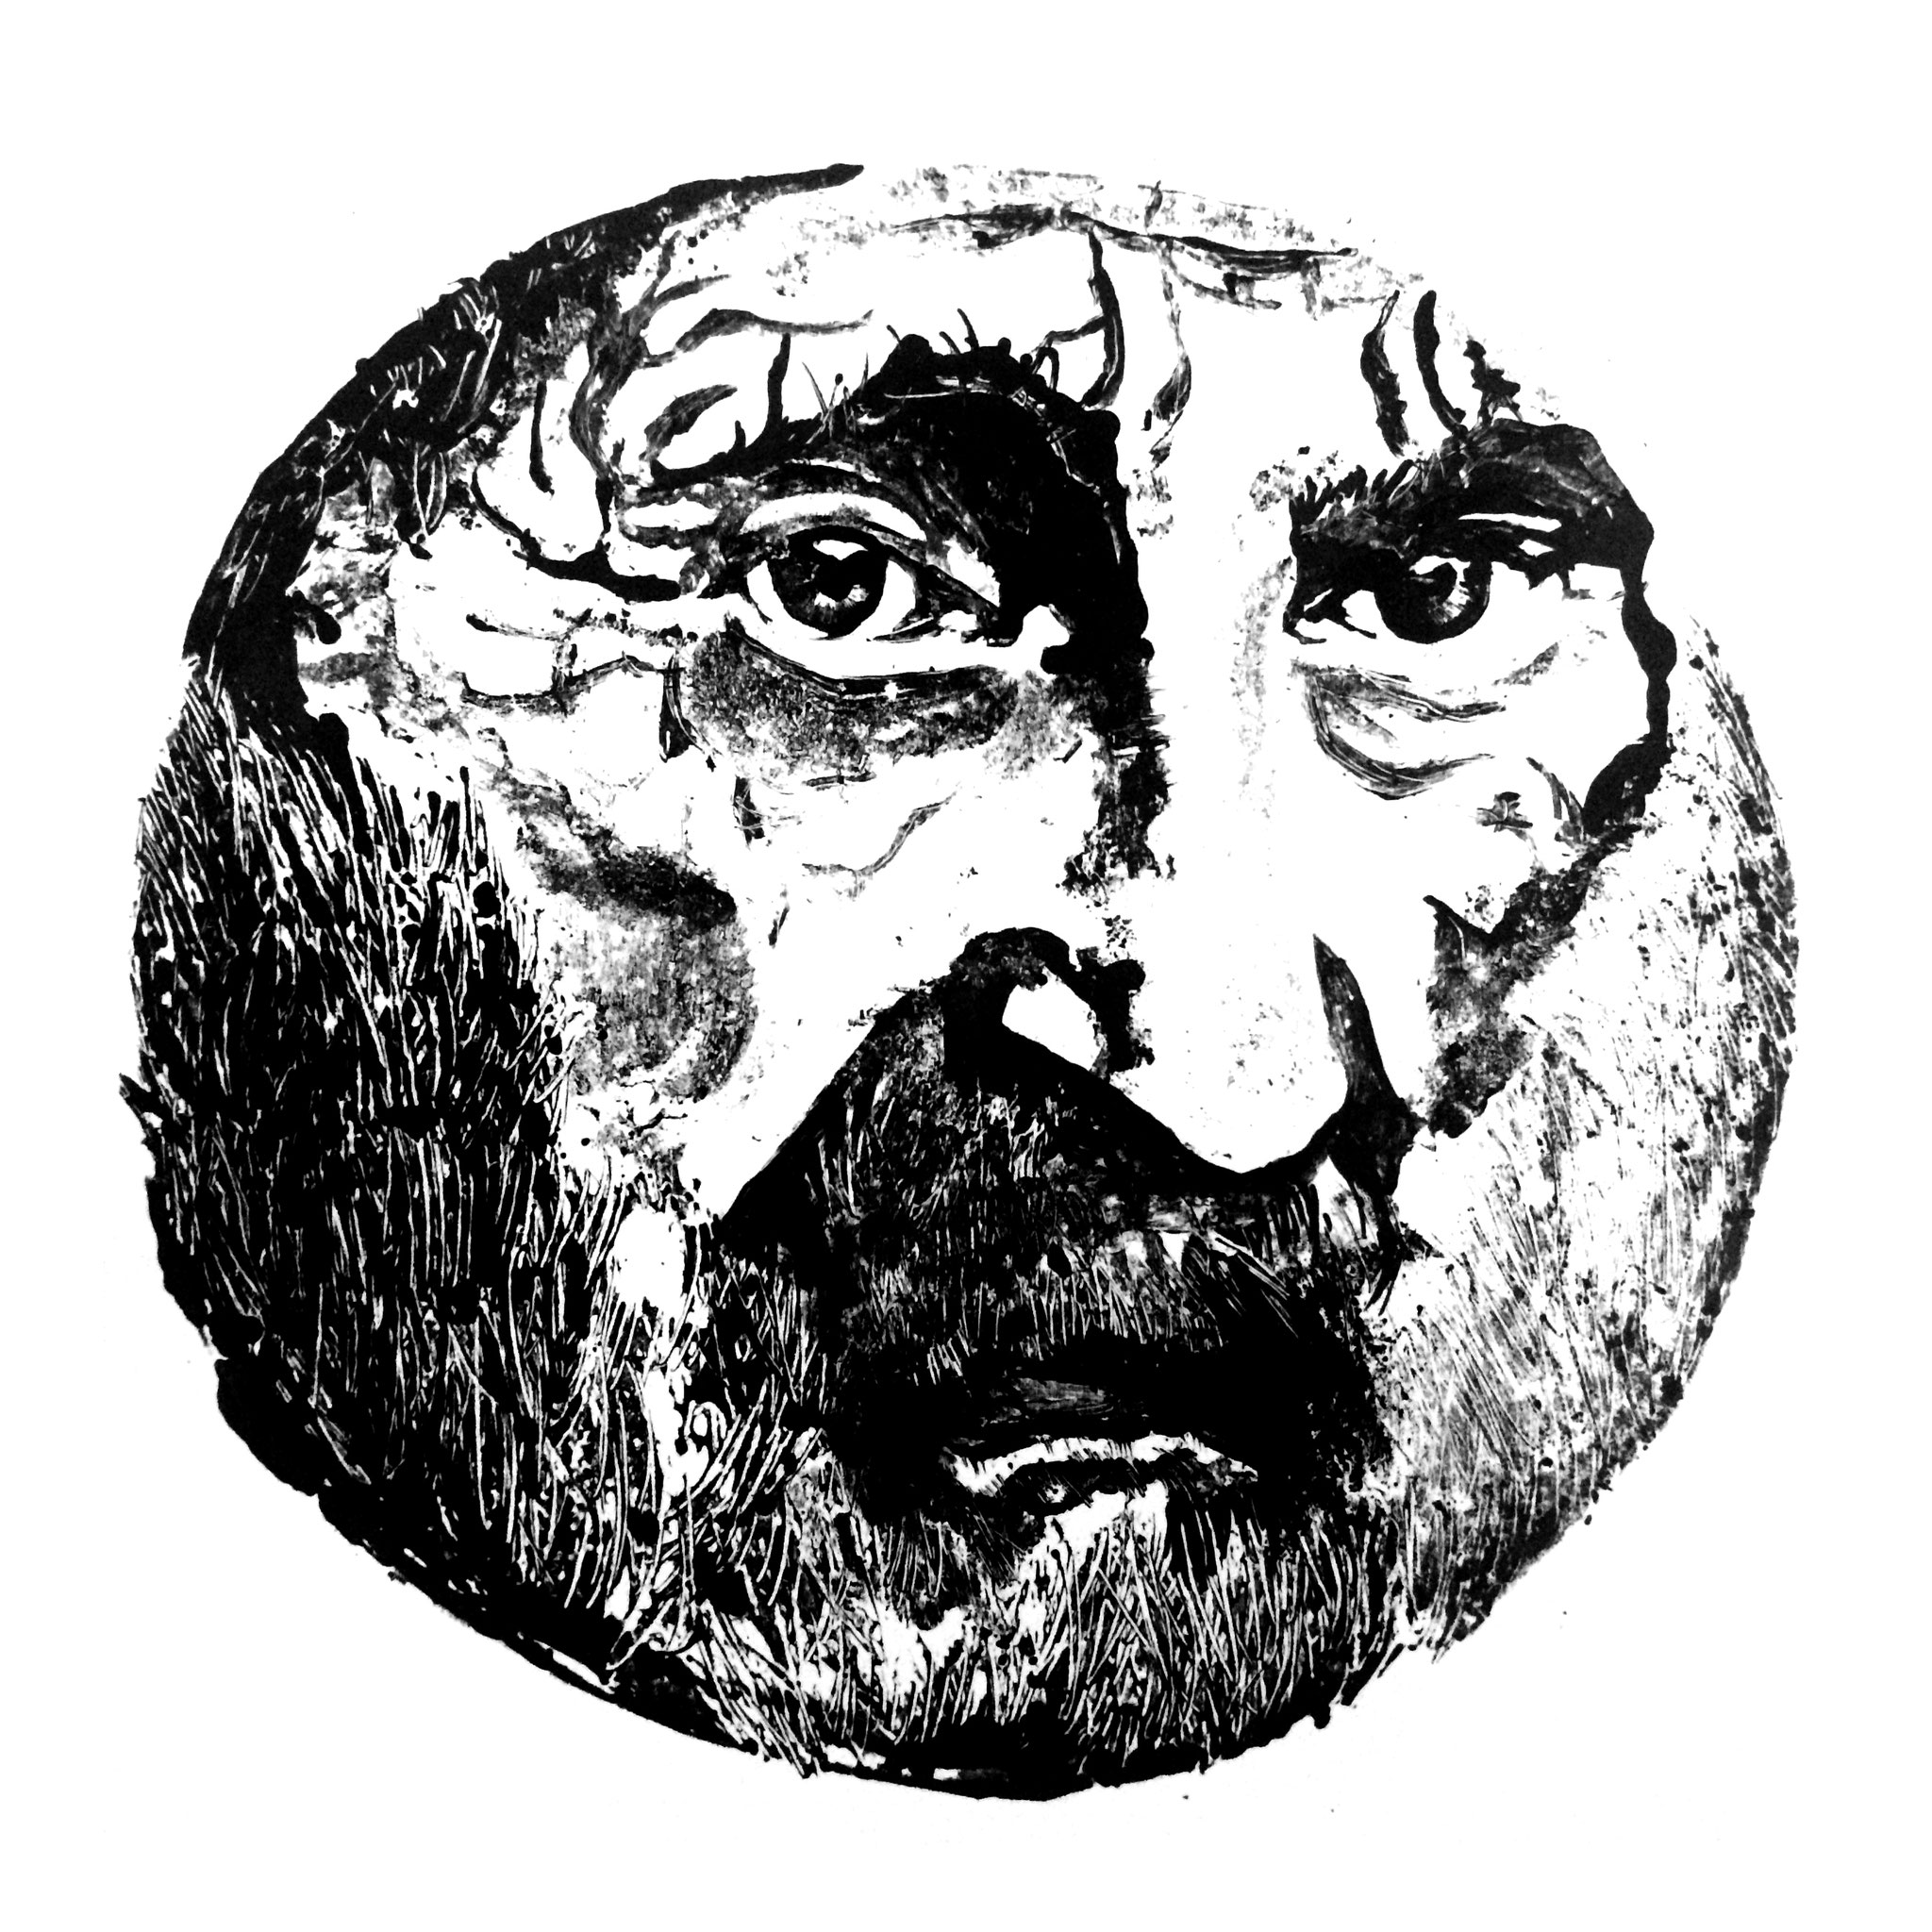 Depth, 45 x 45 cm, ink on paper